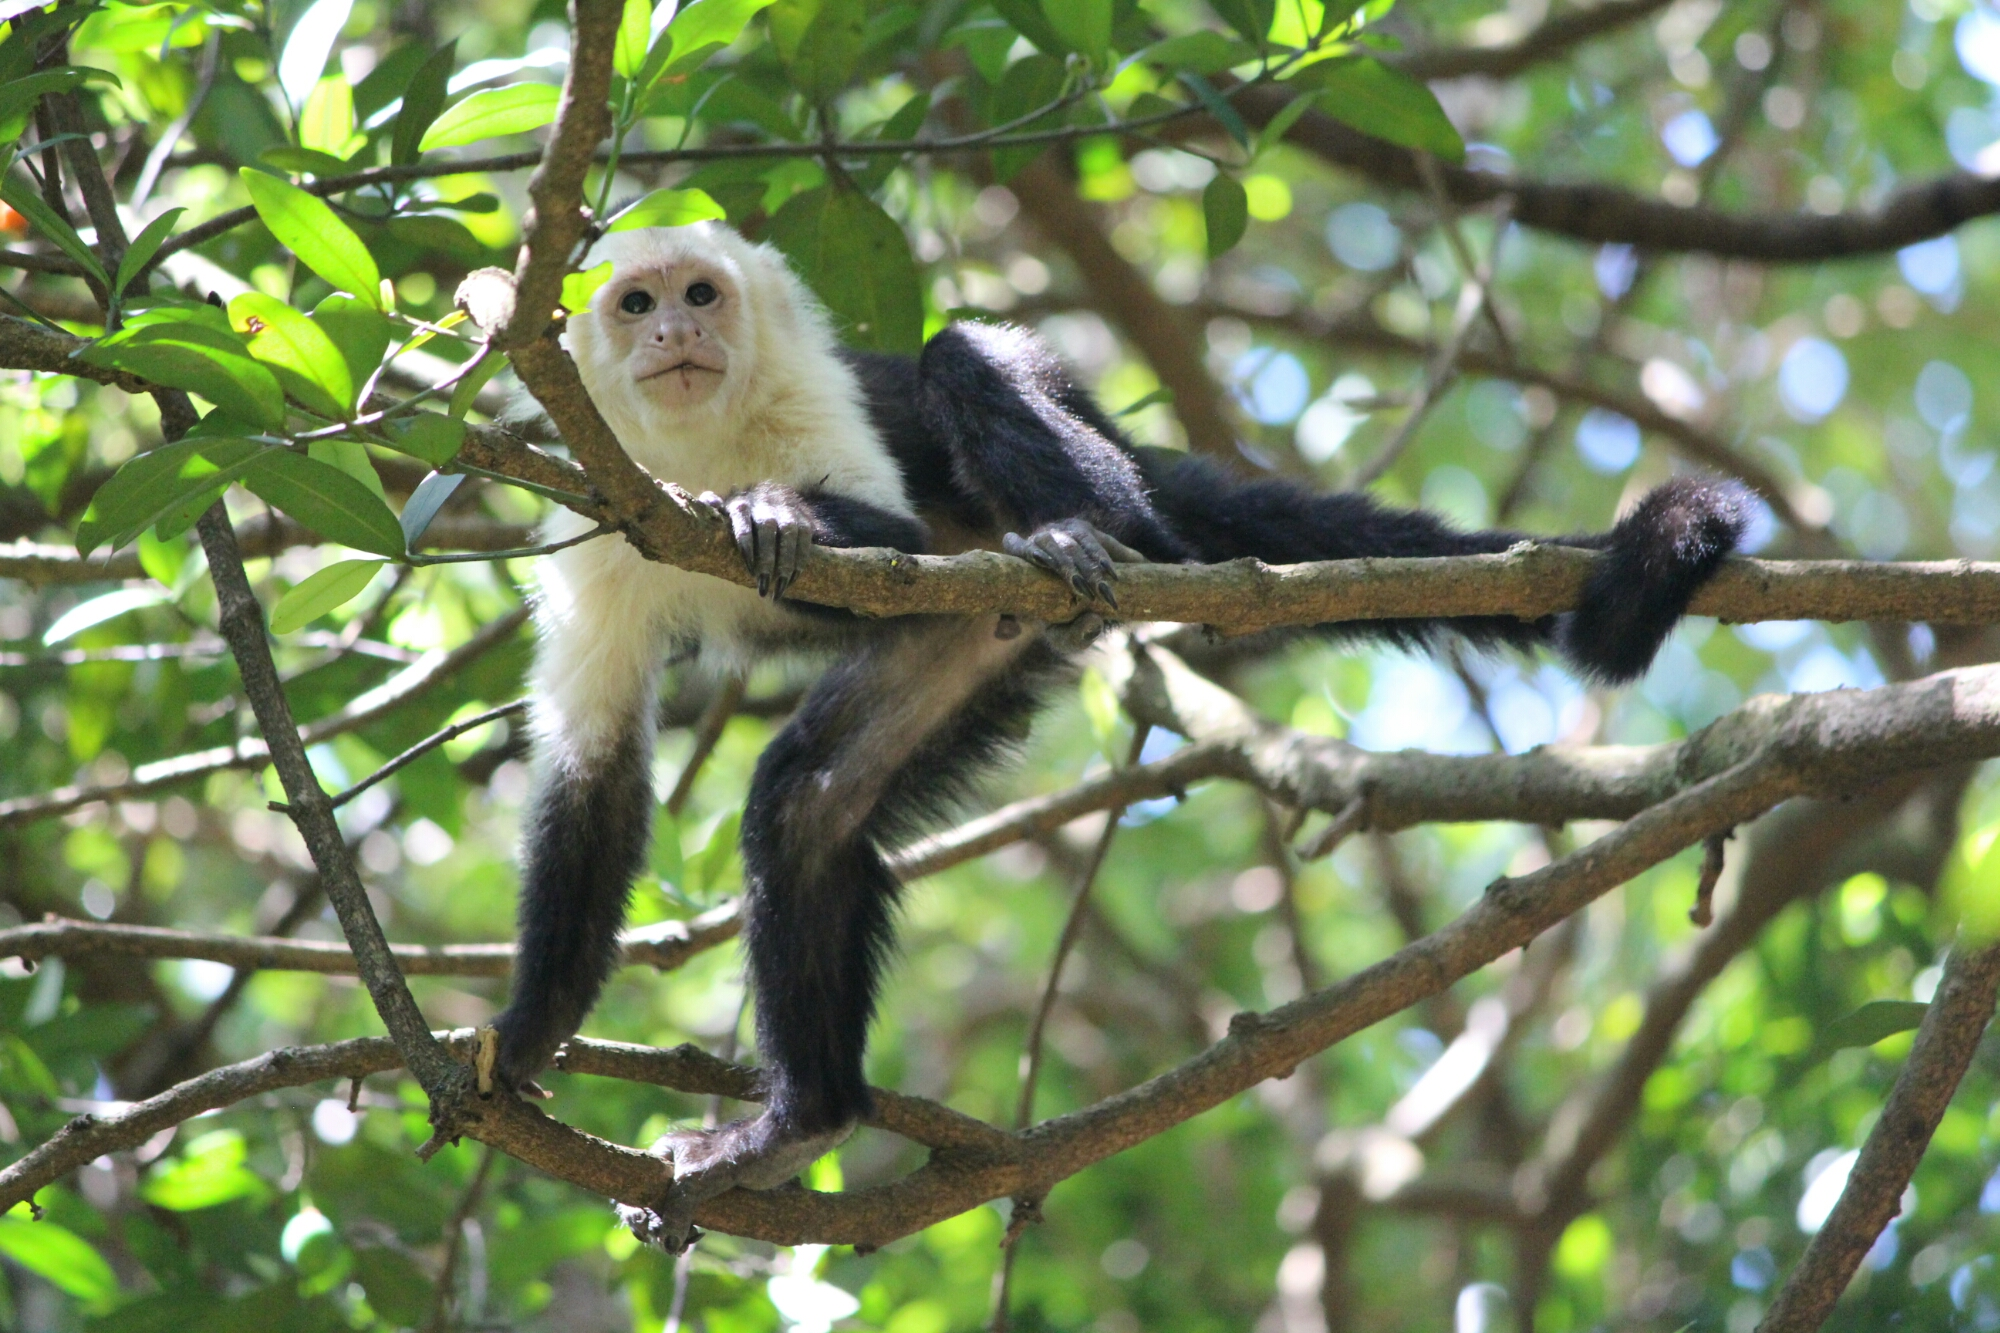 La faune du parc Rincon de la Vieja